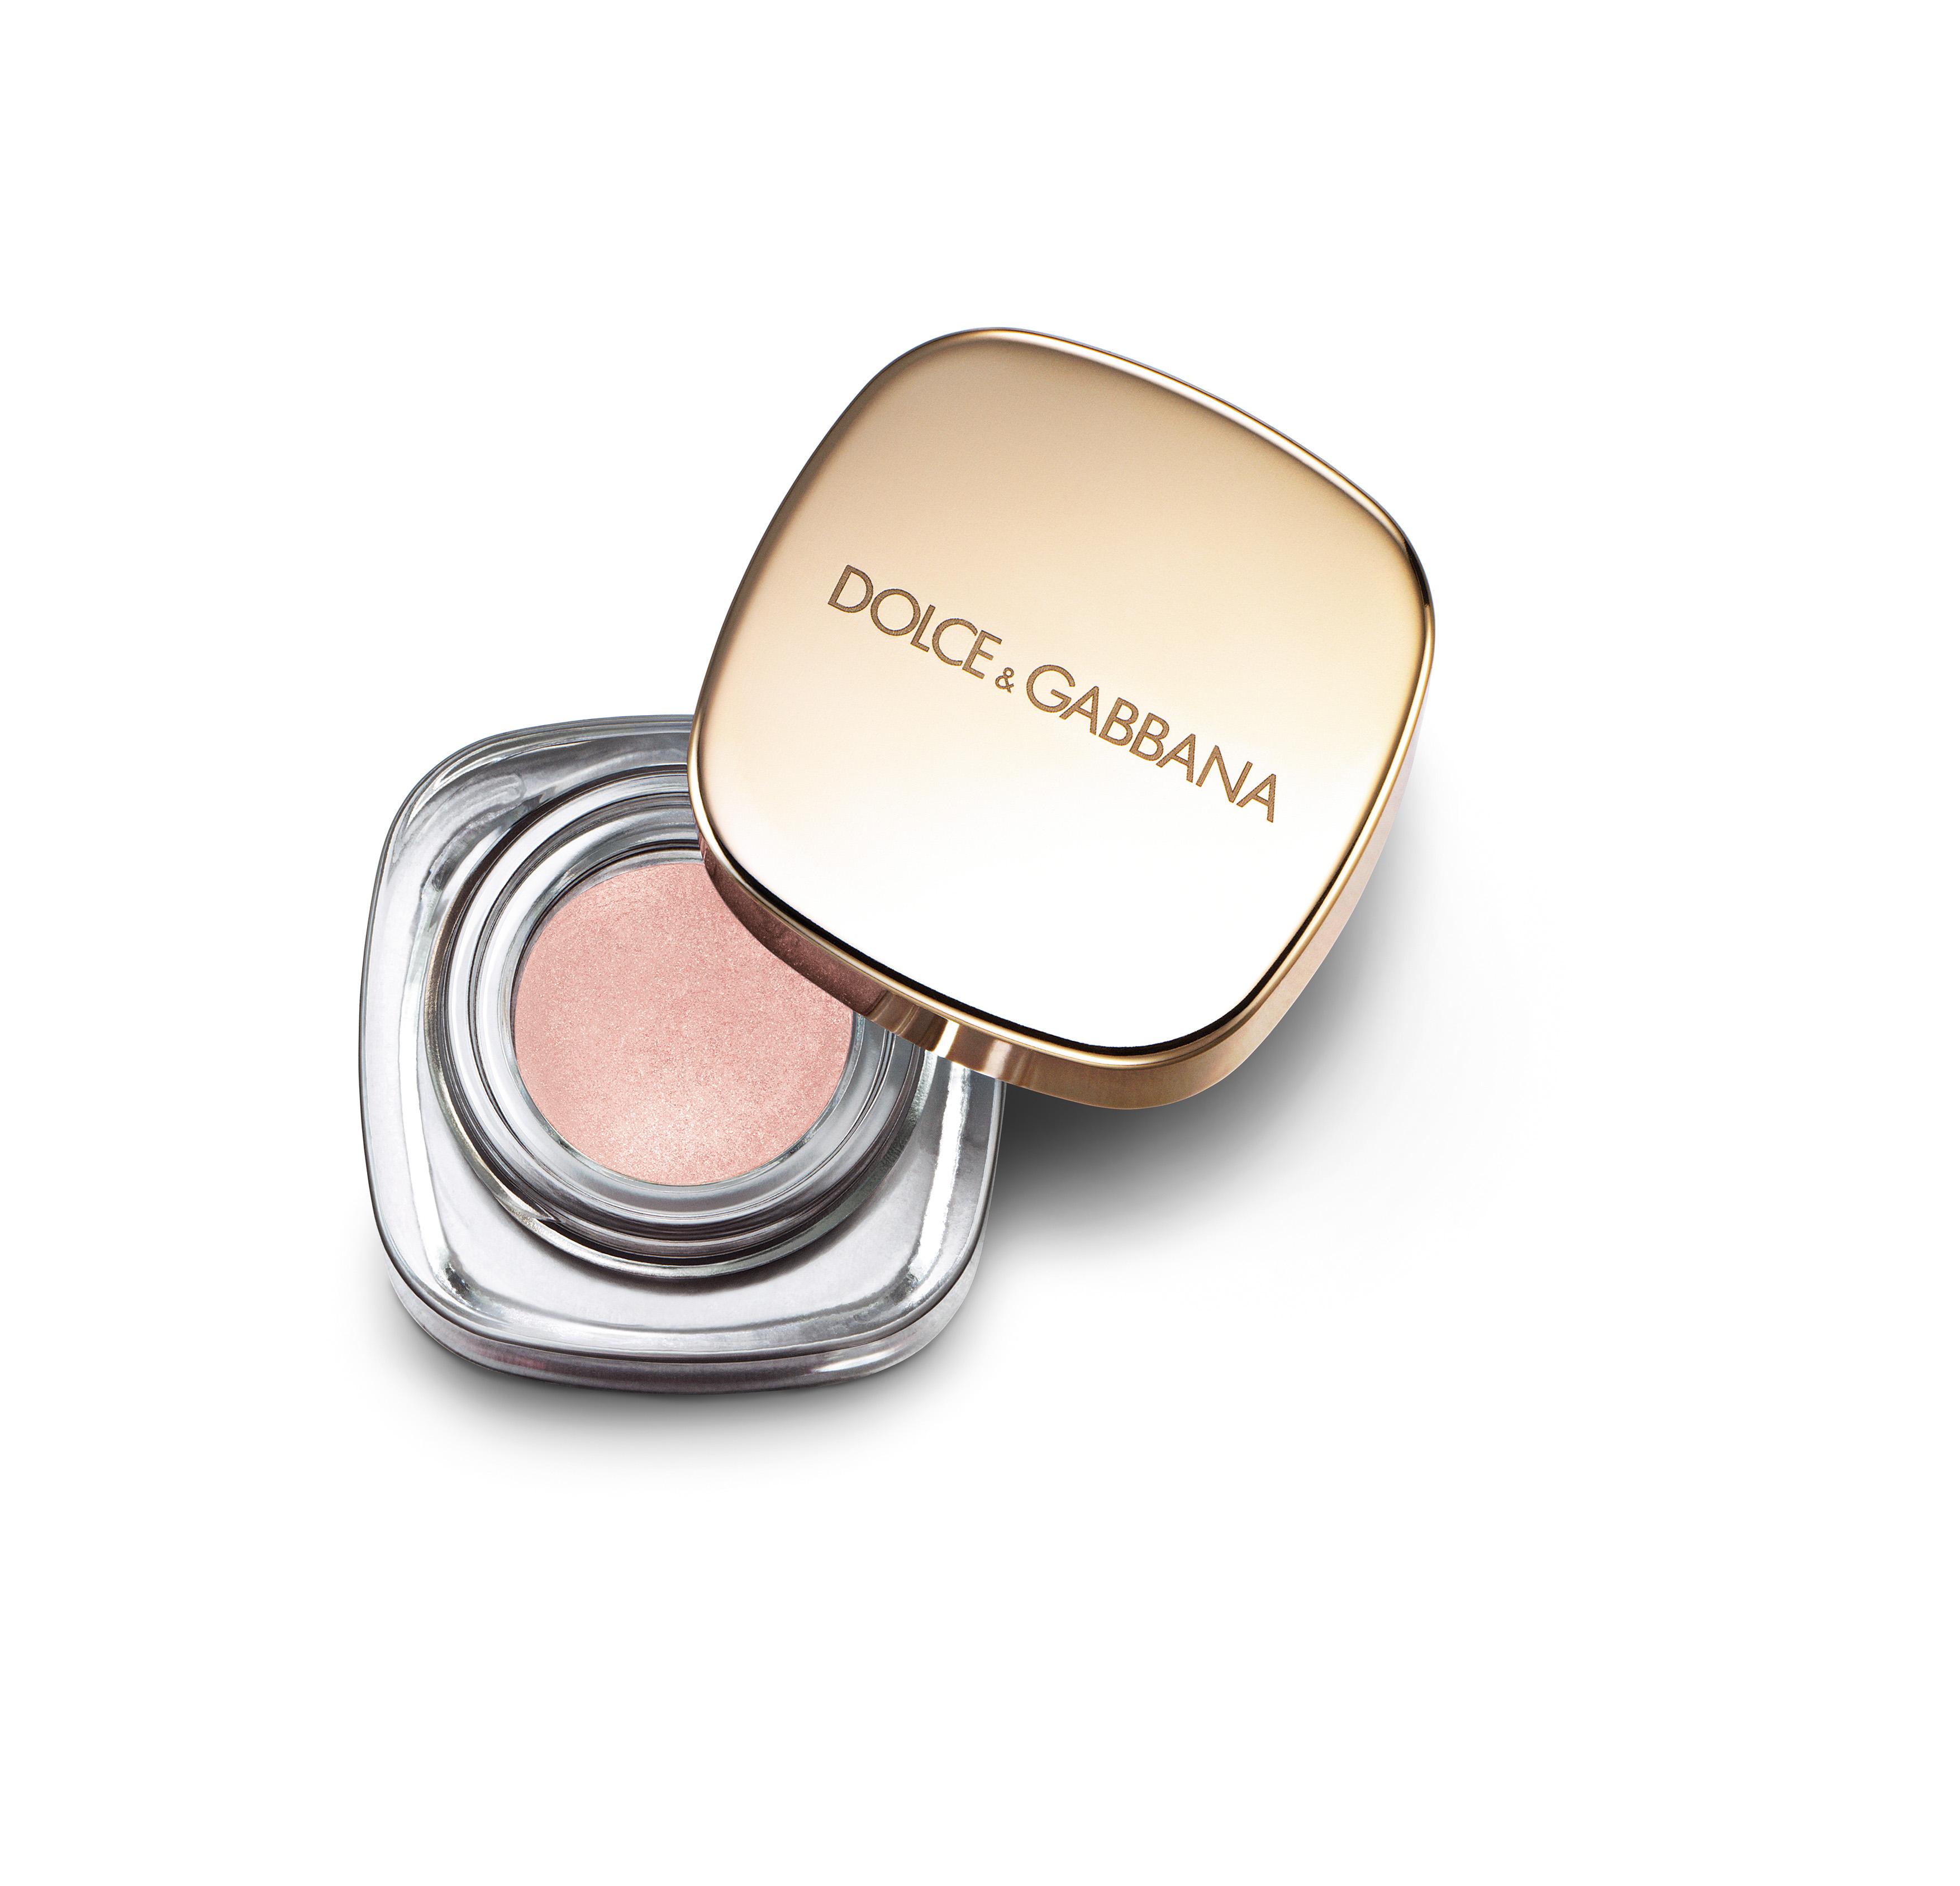 Dolce & Gabbana Perfect Mono Golddust 020